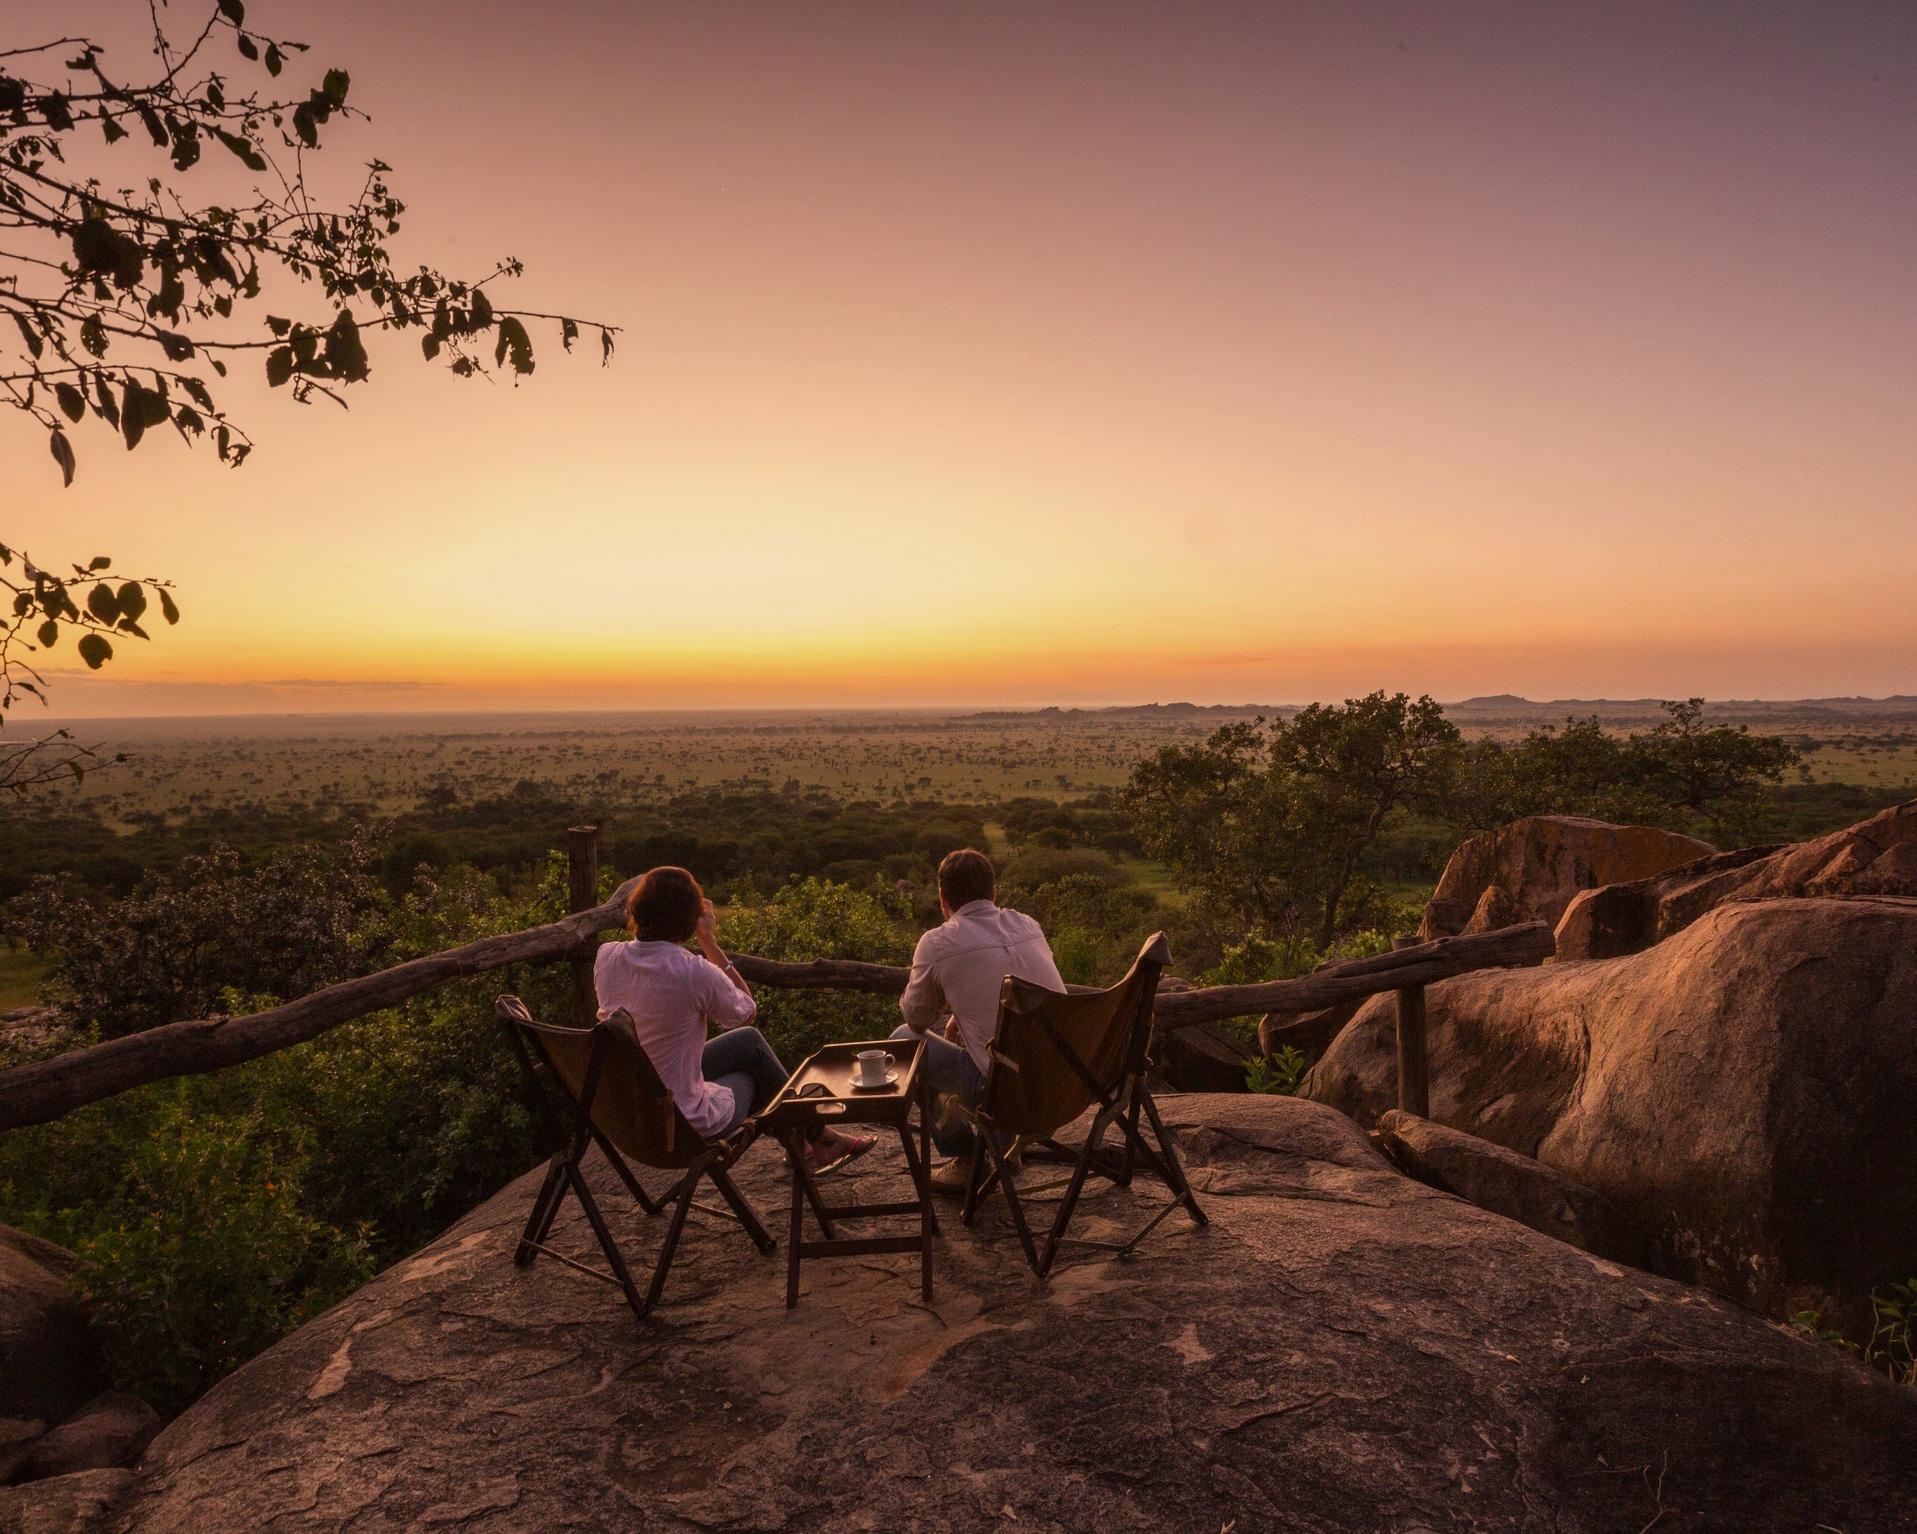 elewana portfolio - serengeti pioneer camp